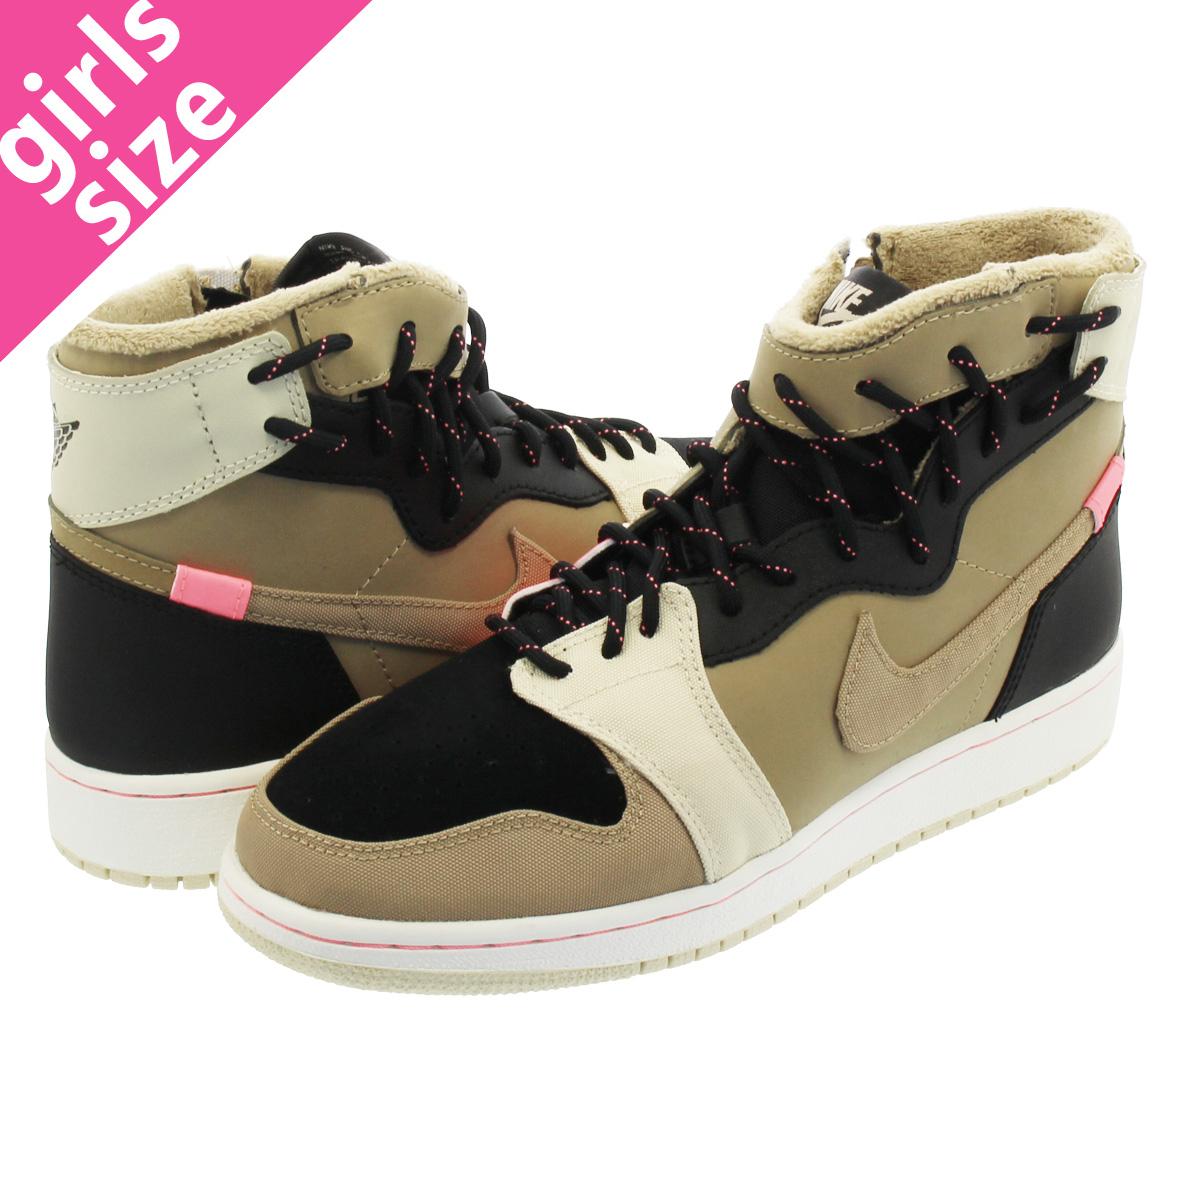 63e0794c13d82e NIKE WMNS AIR JORDAN 1 REBEL XX UT PK Nike women Air Jordan 1 level XX  PARACHUTE BEIGE BLACK bq6481-200